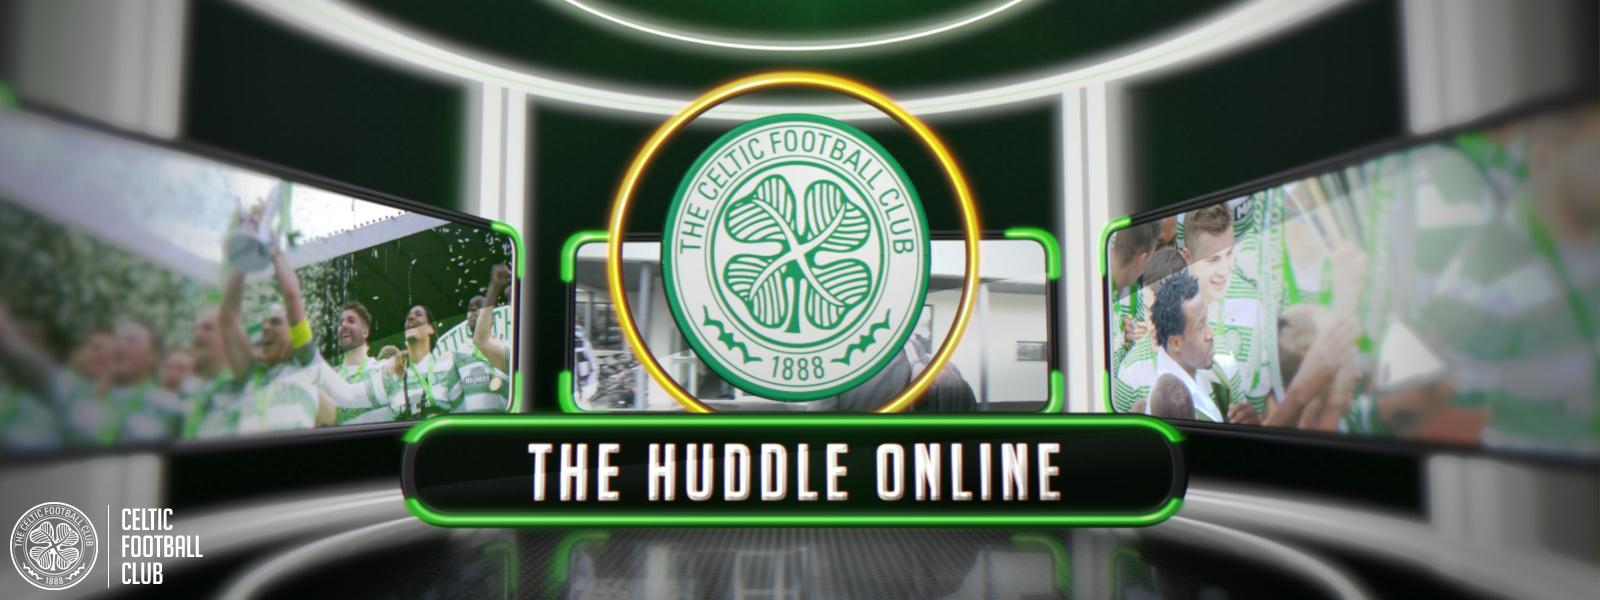 The Huddle Online